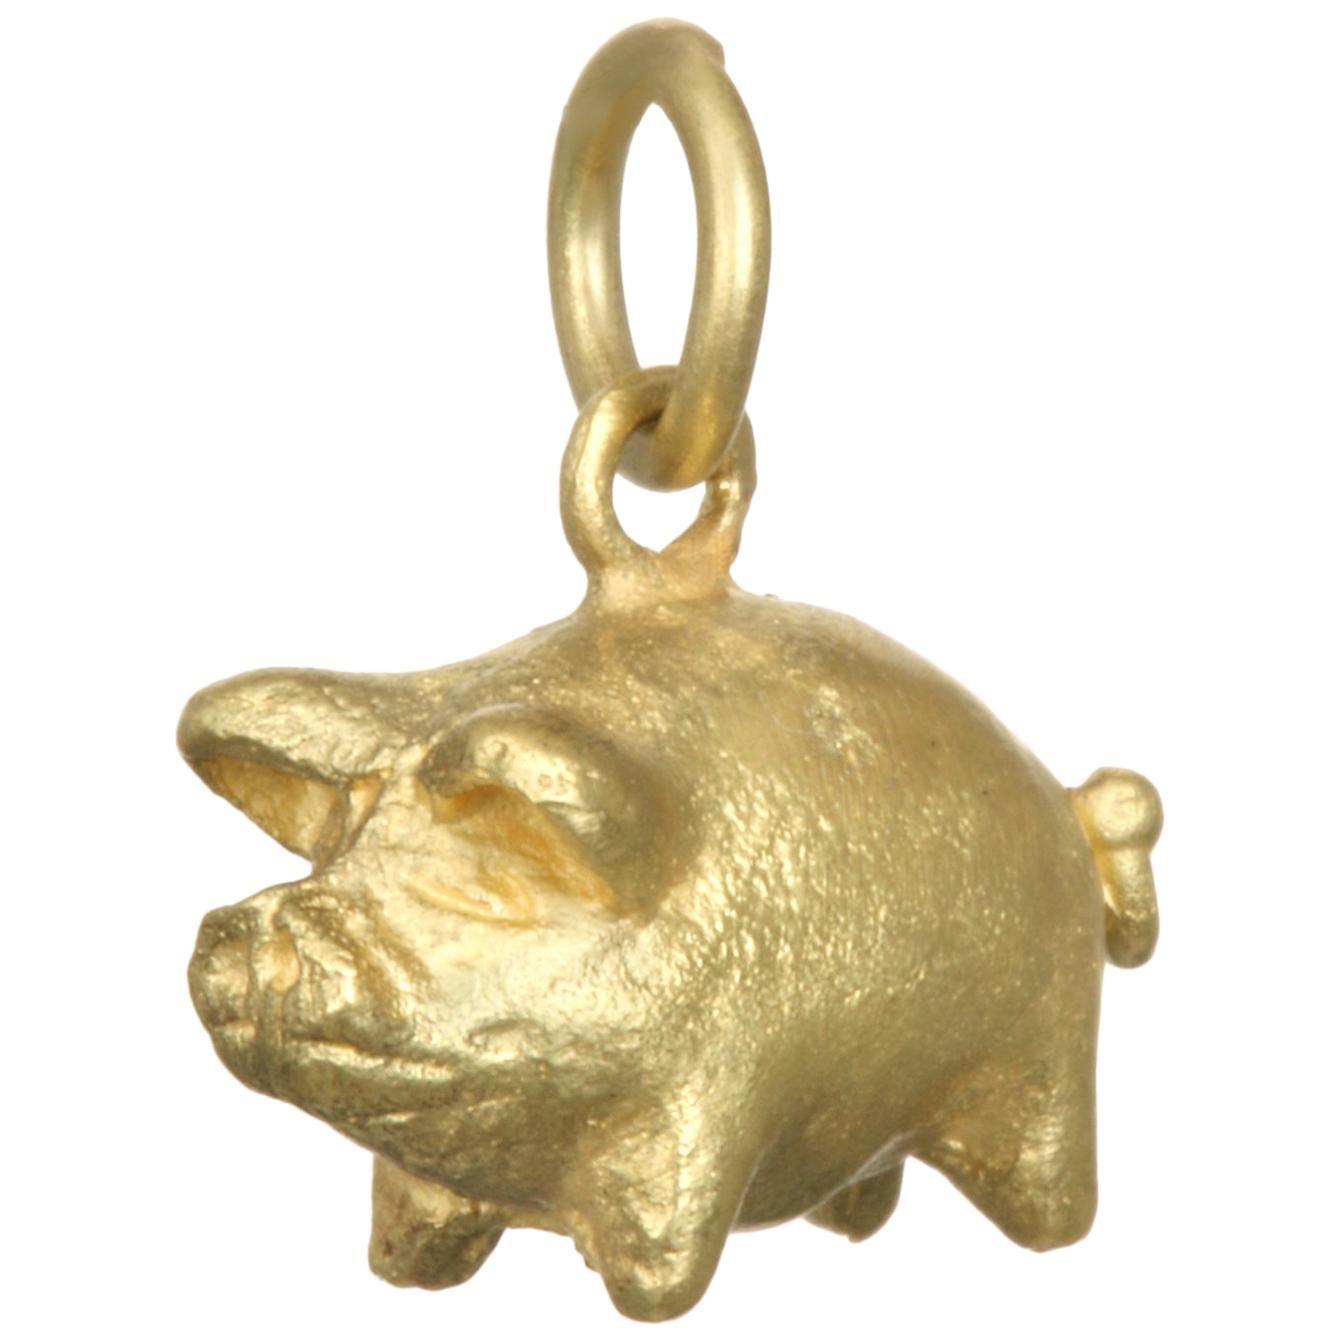 Faye Kim 18K Gold Pig Charm Necklace